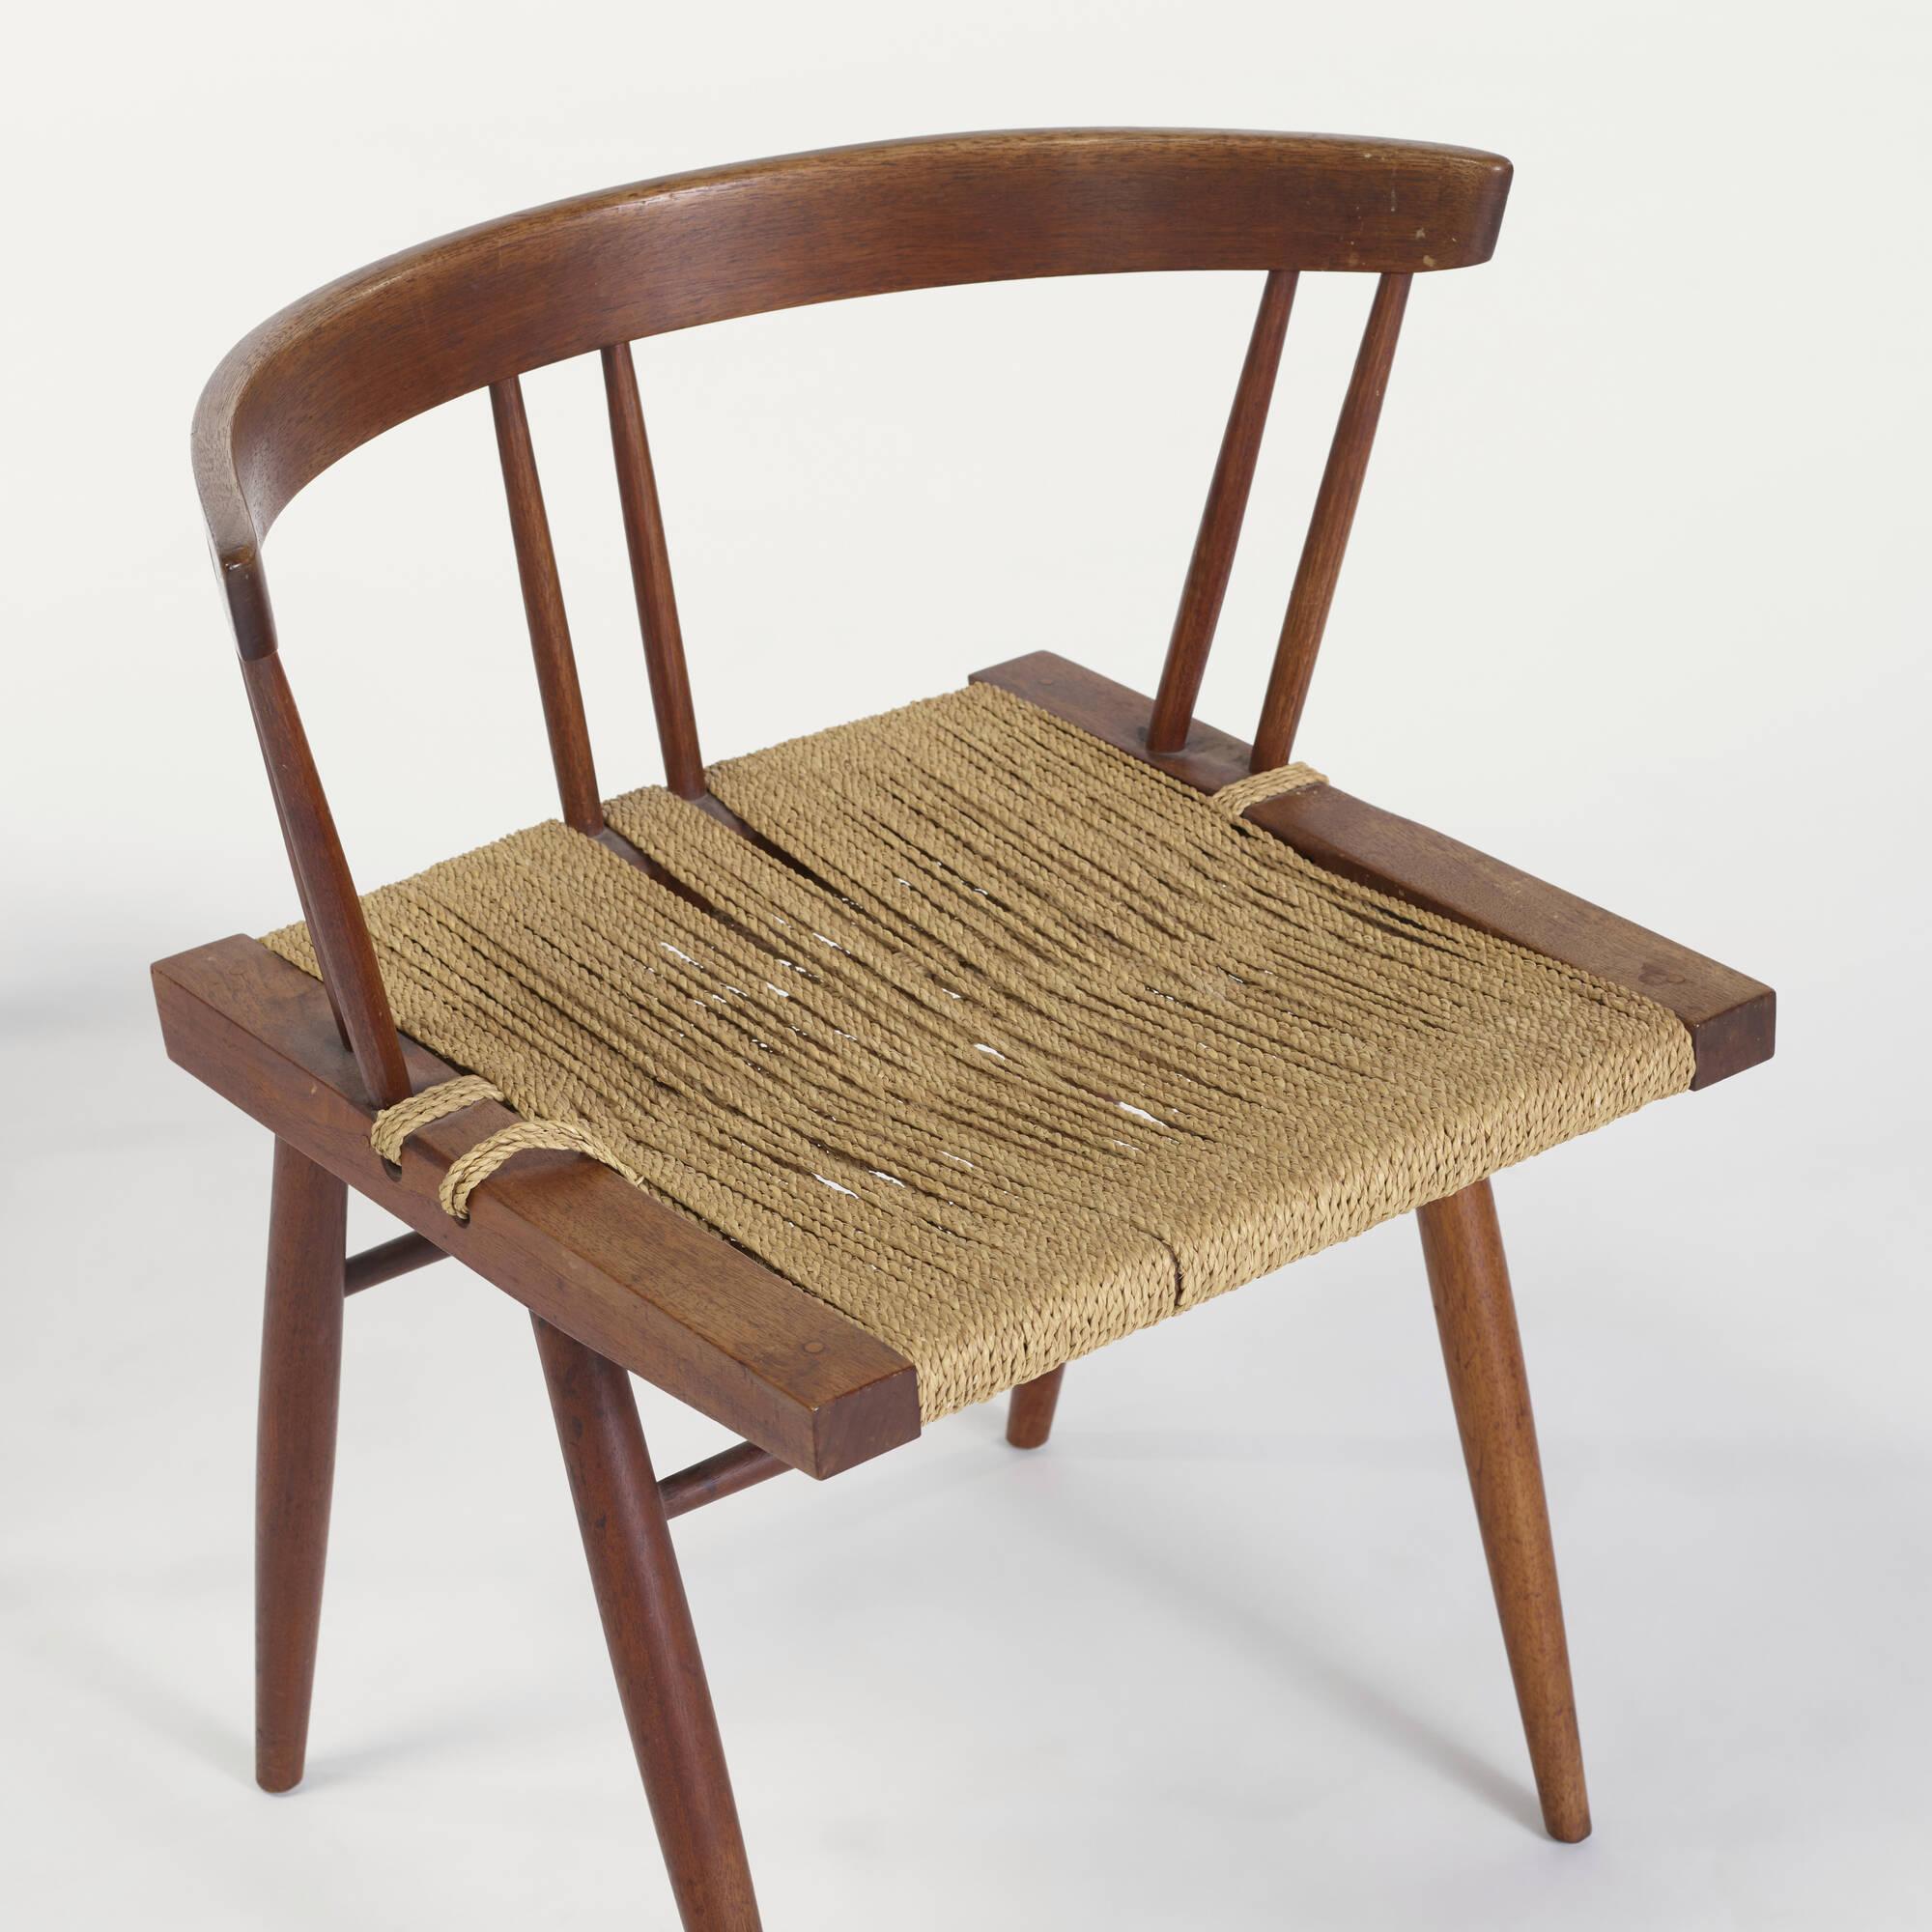 142 George Nakashima Grass Seated chairs pair Design 24